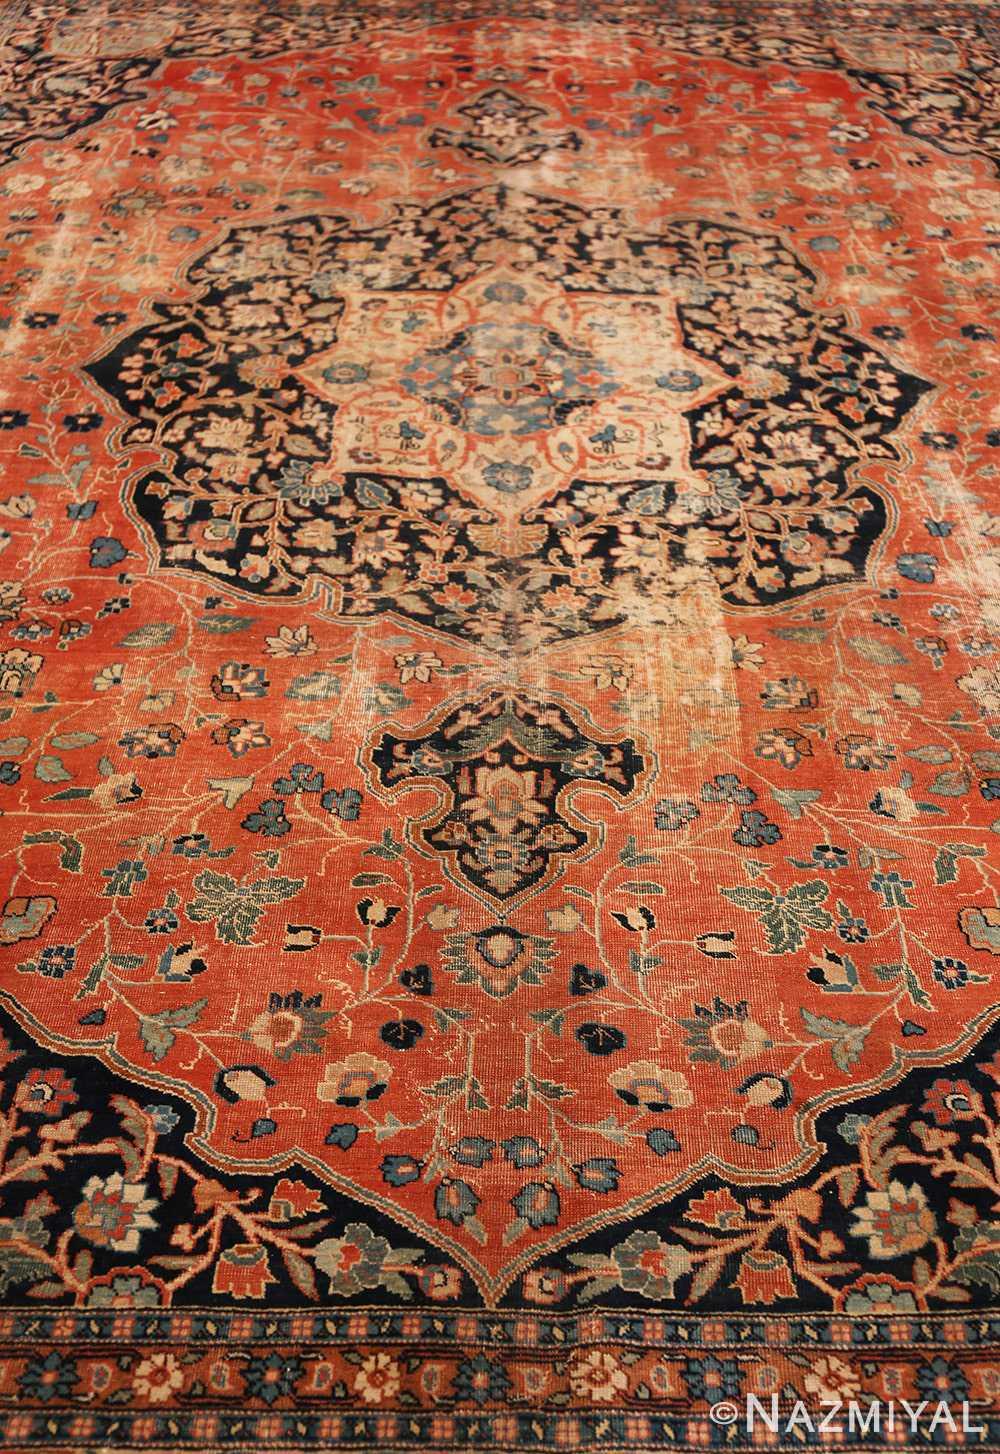 Field Beautiful Shabby chic Antique Persian Tabriz rug 47294 by Nazmiyal